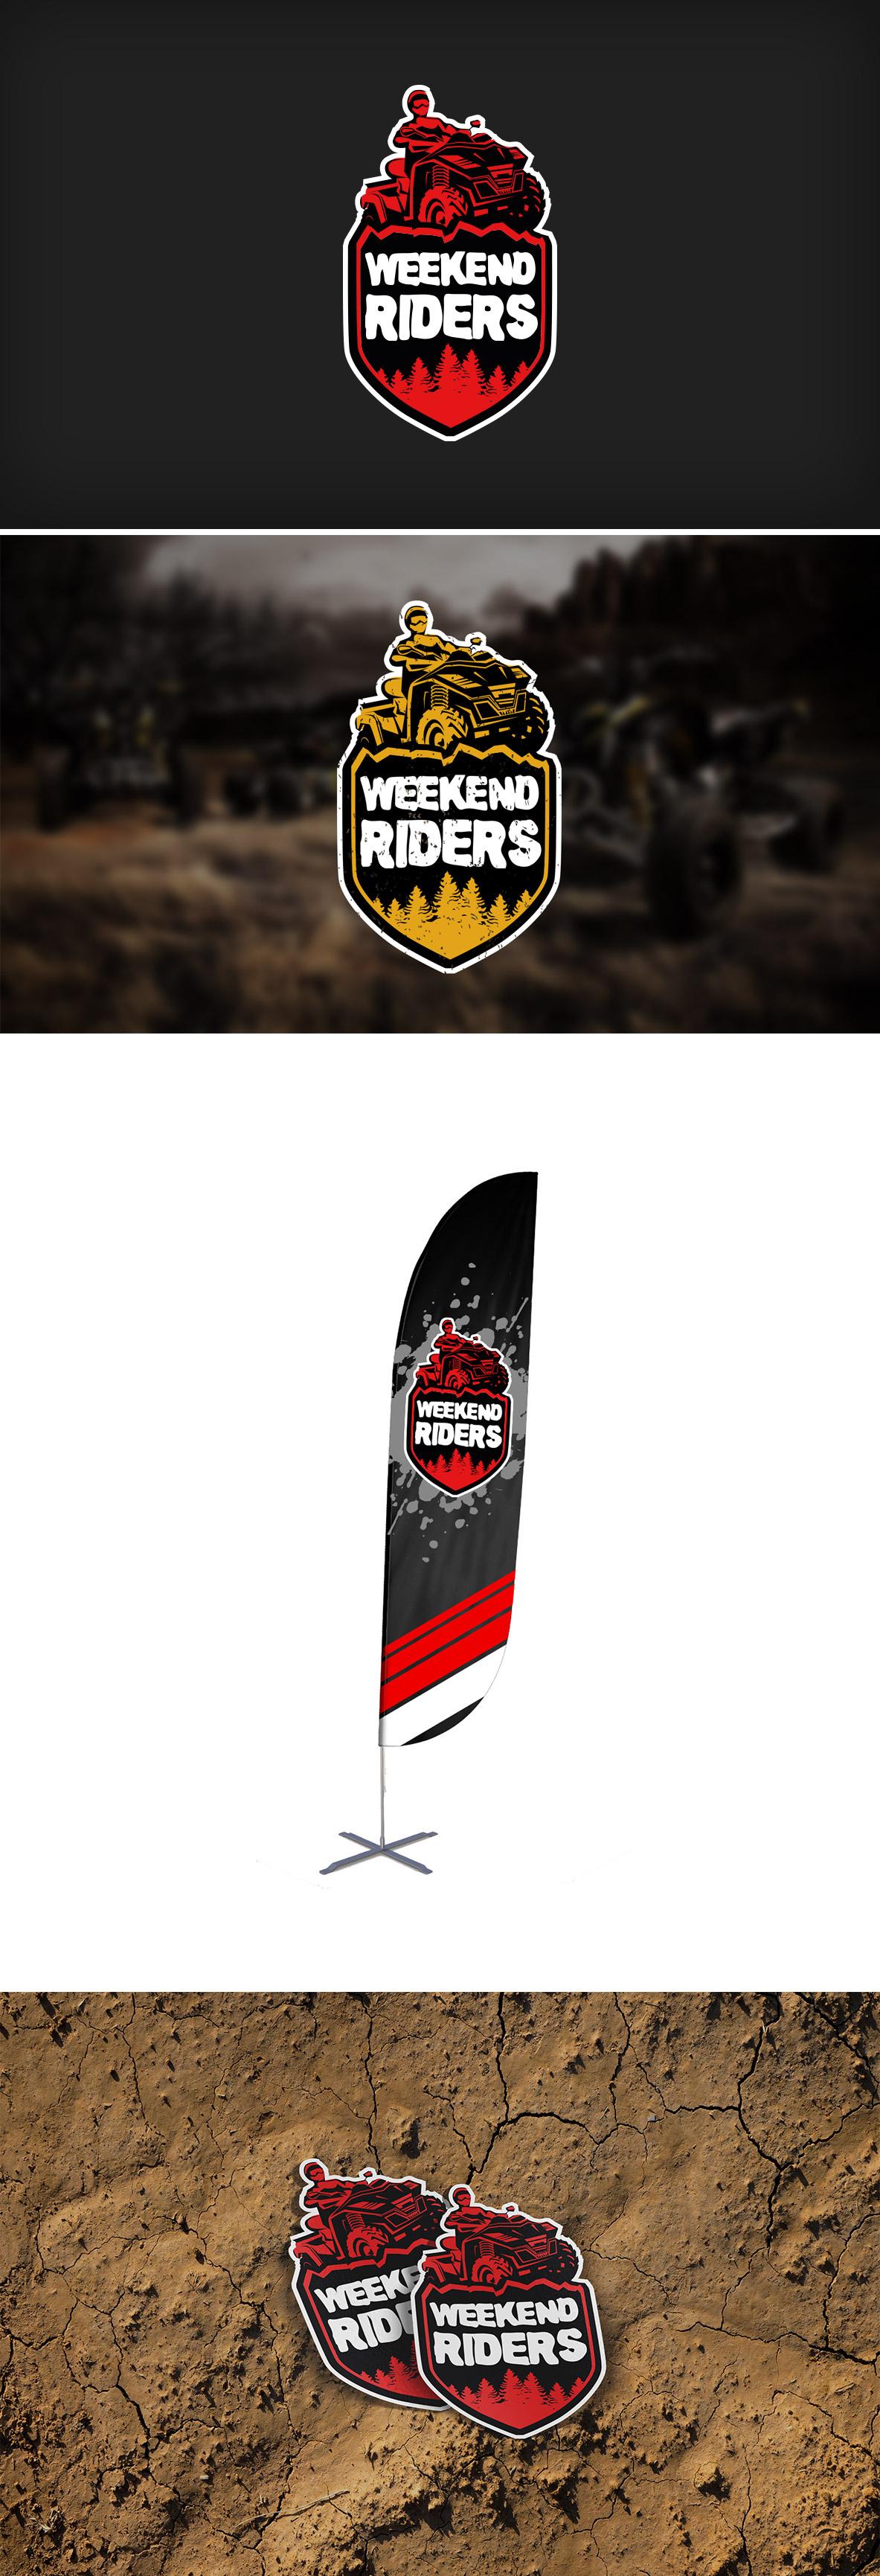 Weekend riders logo design Lukáš Kejha